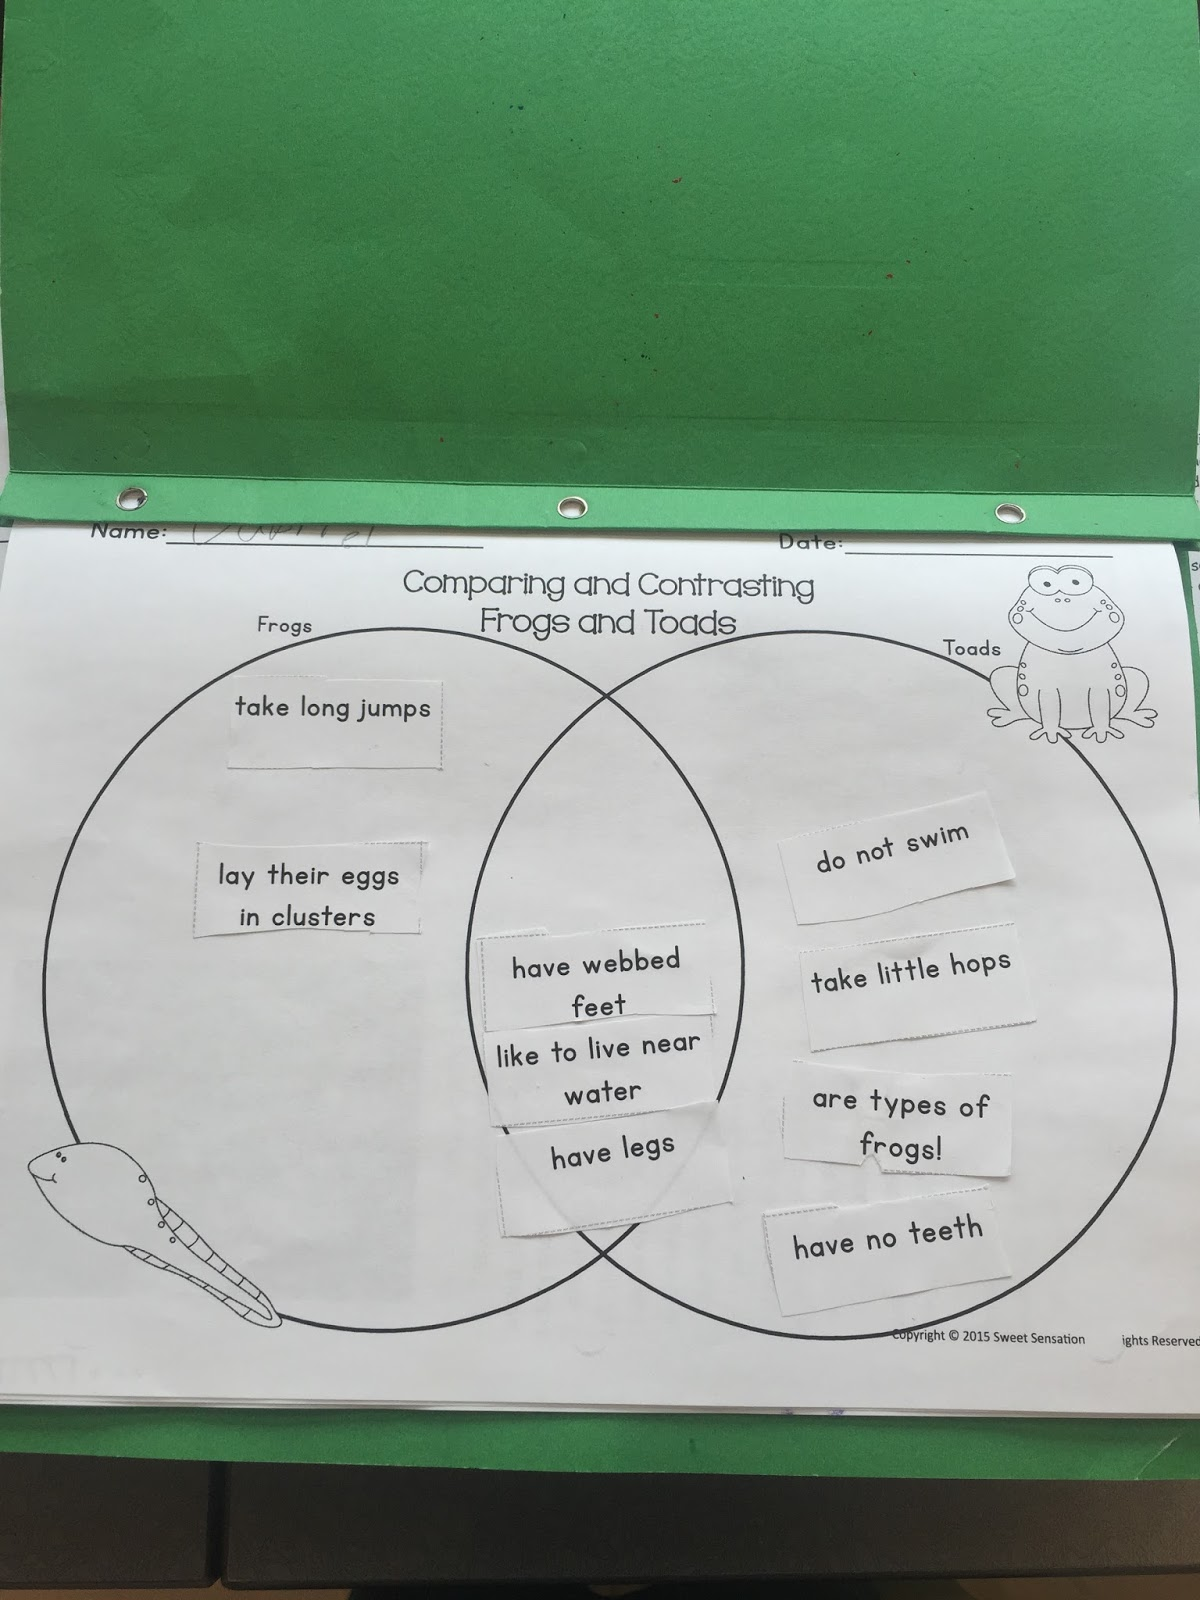 Frog And Toad Venn Diagram Digital Clock Circuit Using 555 Timer Miss Vanchu 39s Classroom Blog Life Cycle Of A